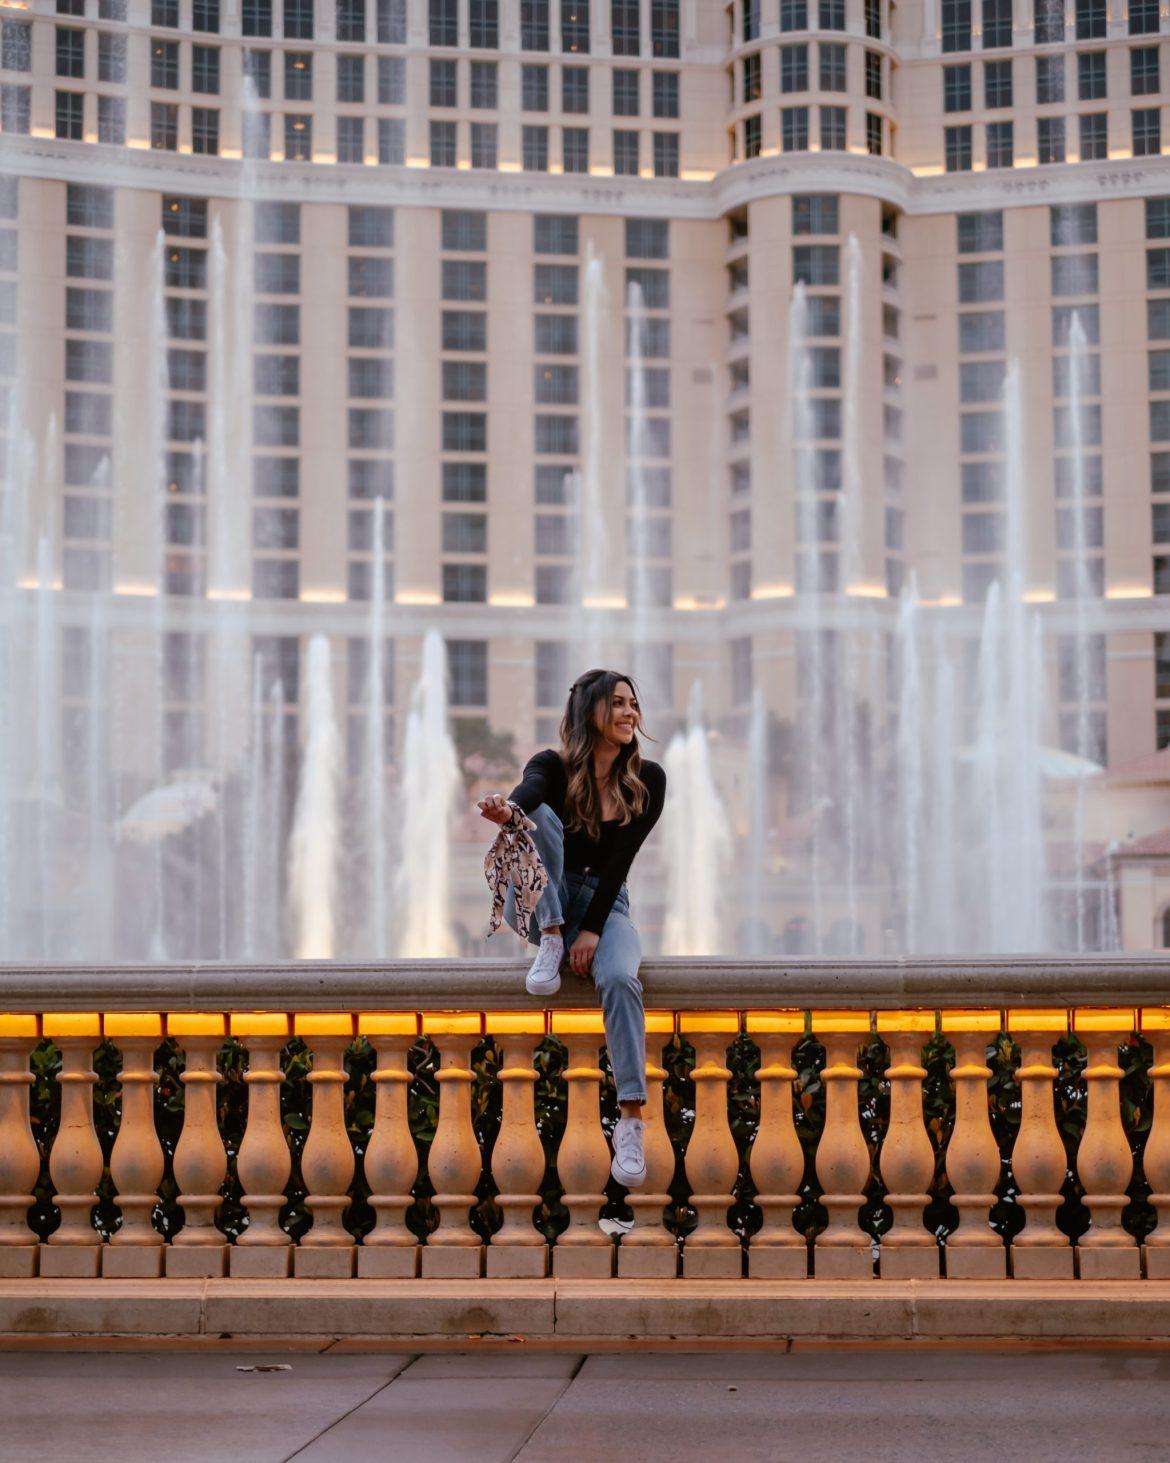 Fountains at the Bellagio, Las Vegas, Nevada